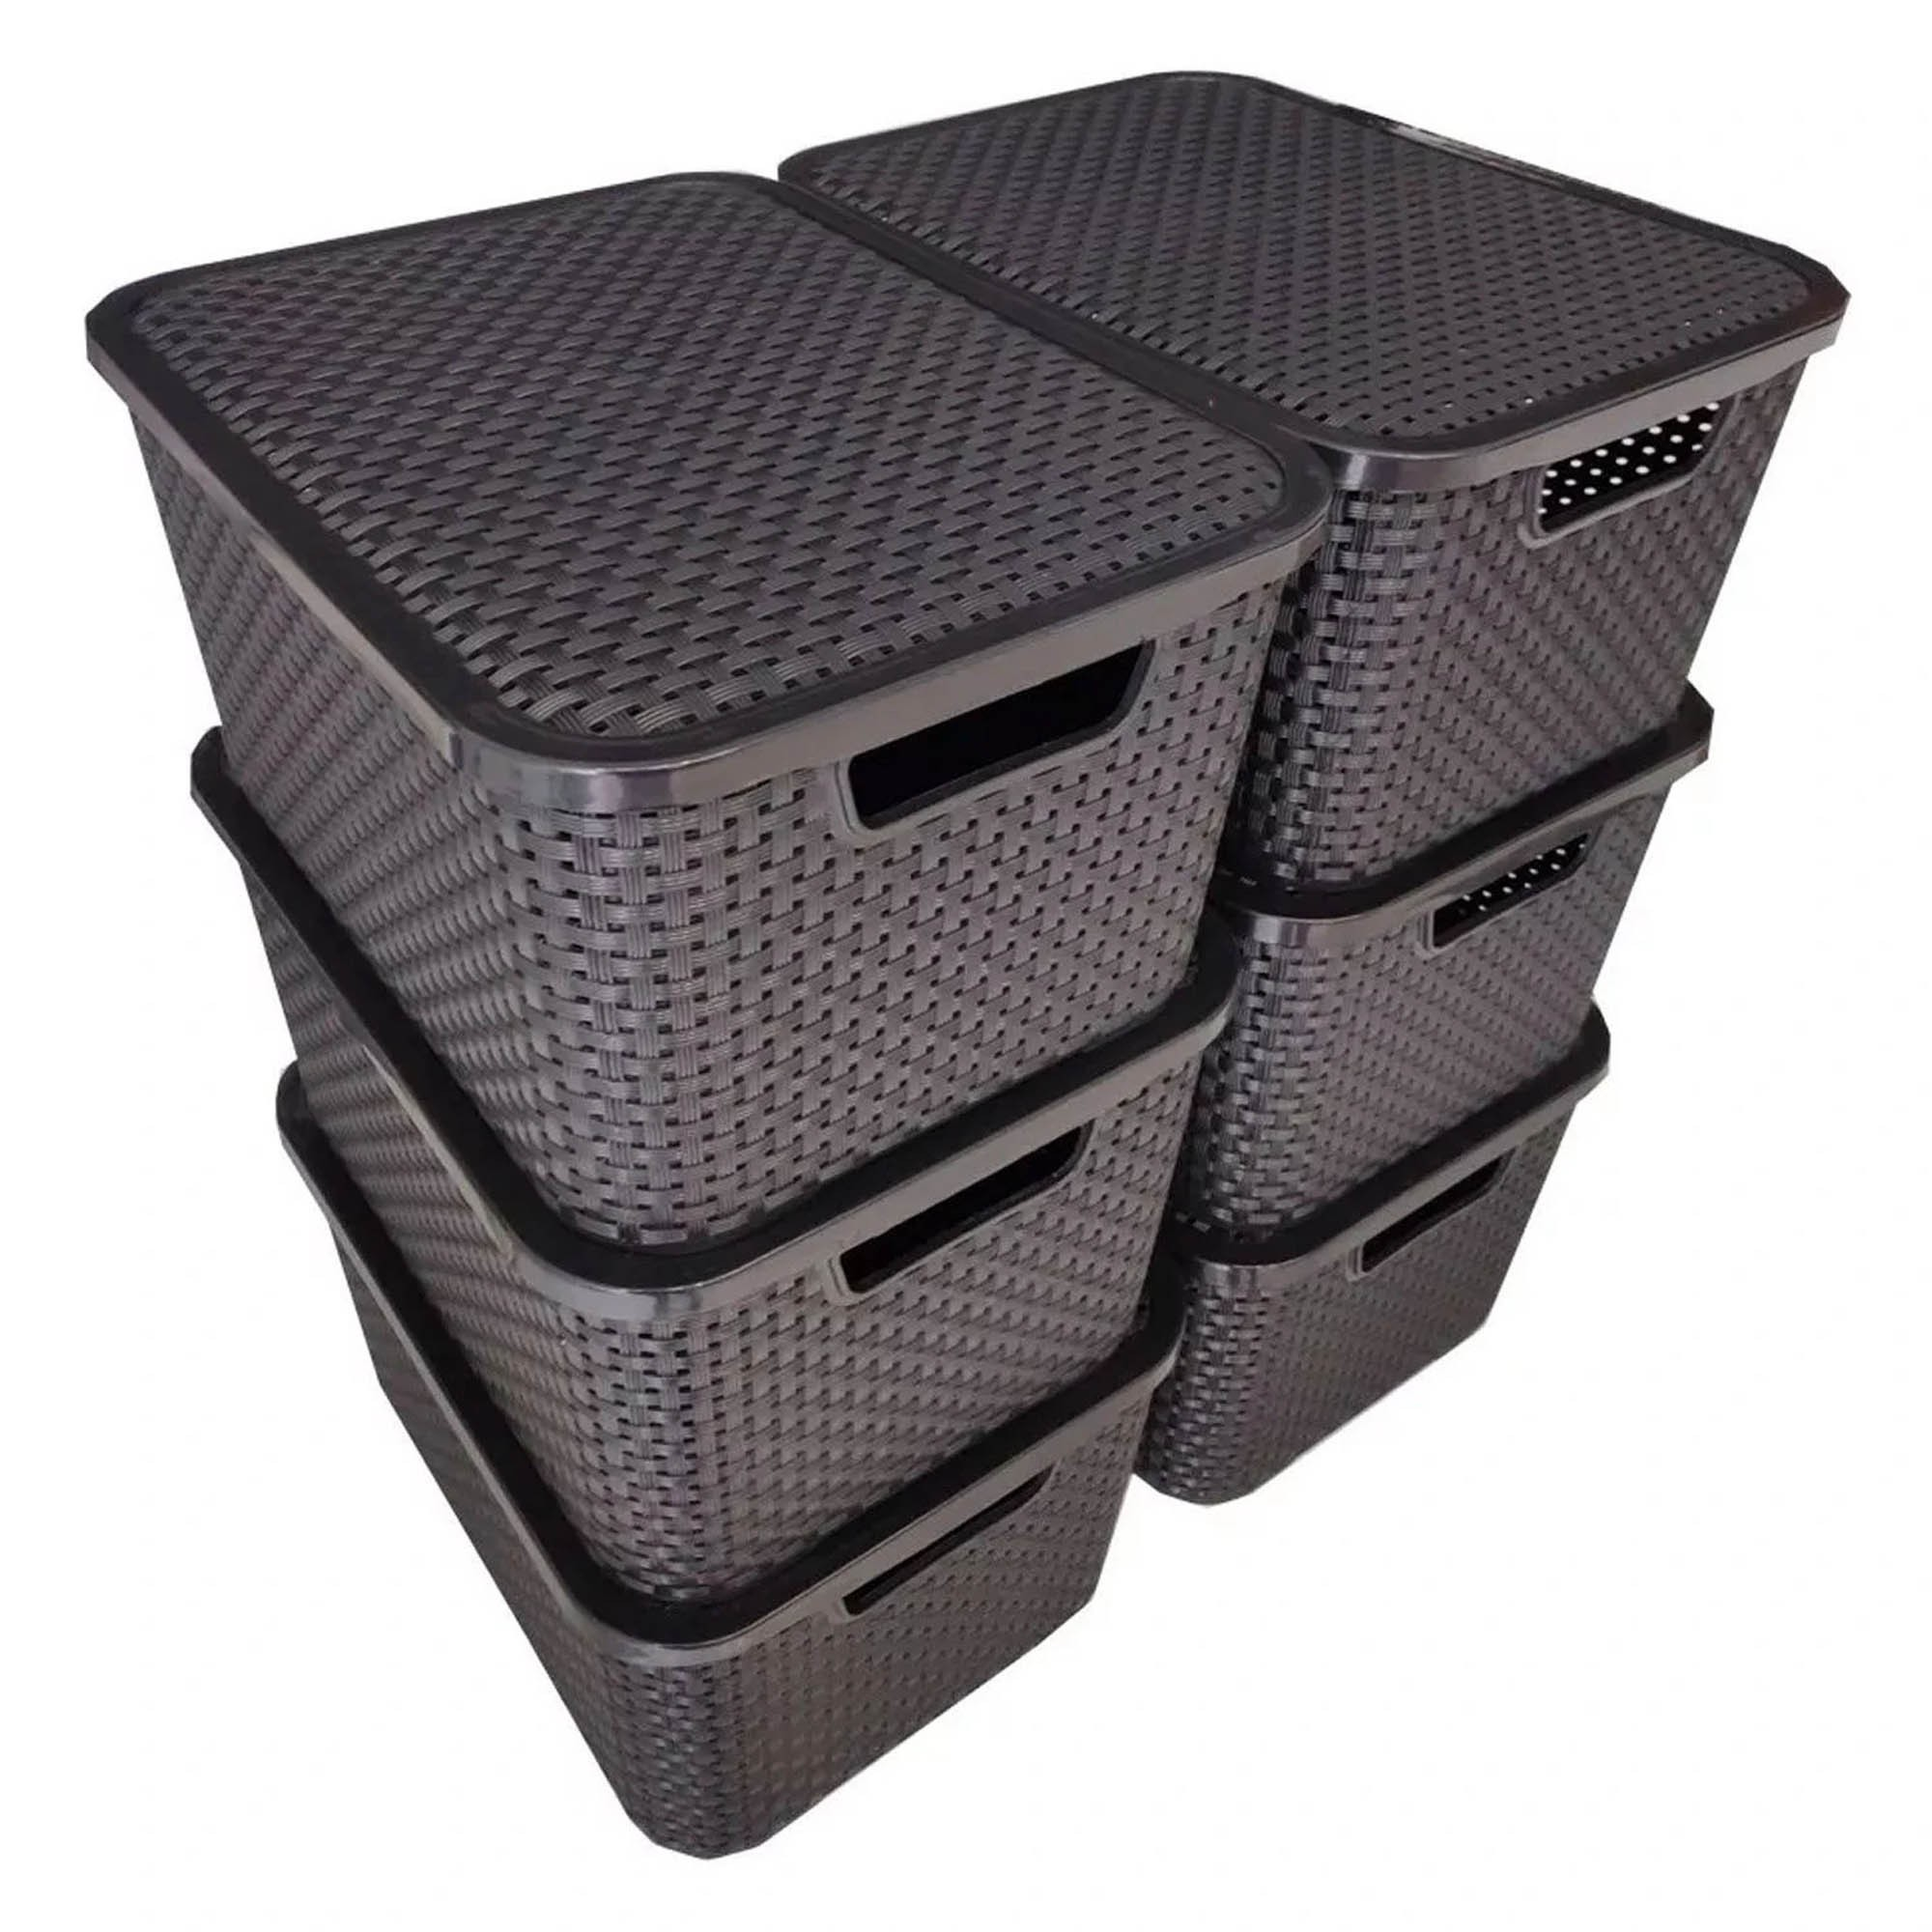 2 x Caixa Organizadora Plástica Cesto Rattan 15 L Com Tampa